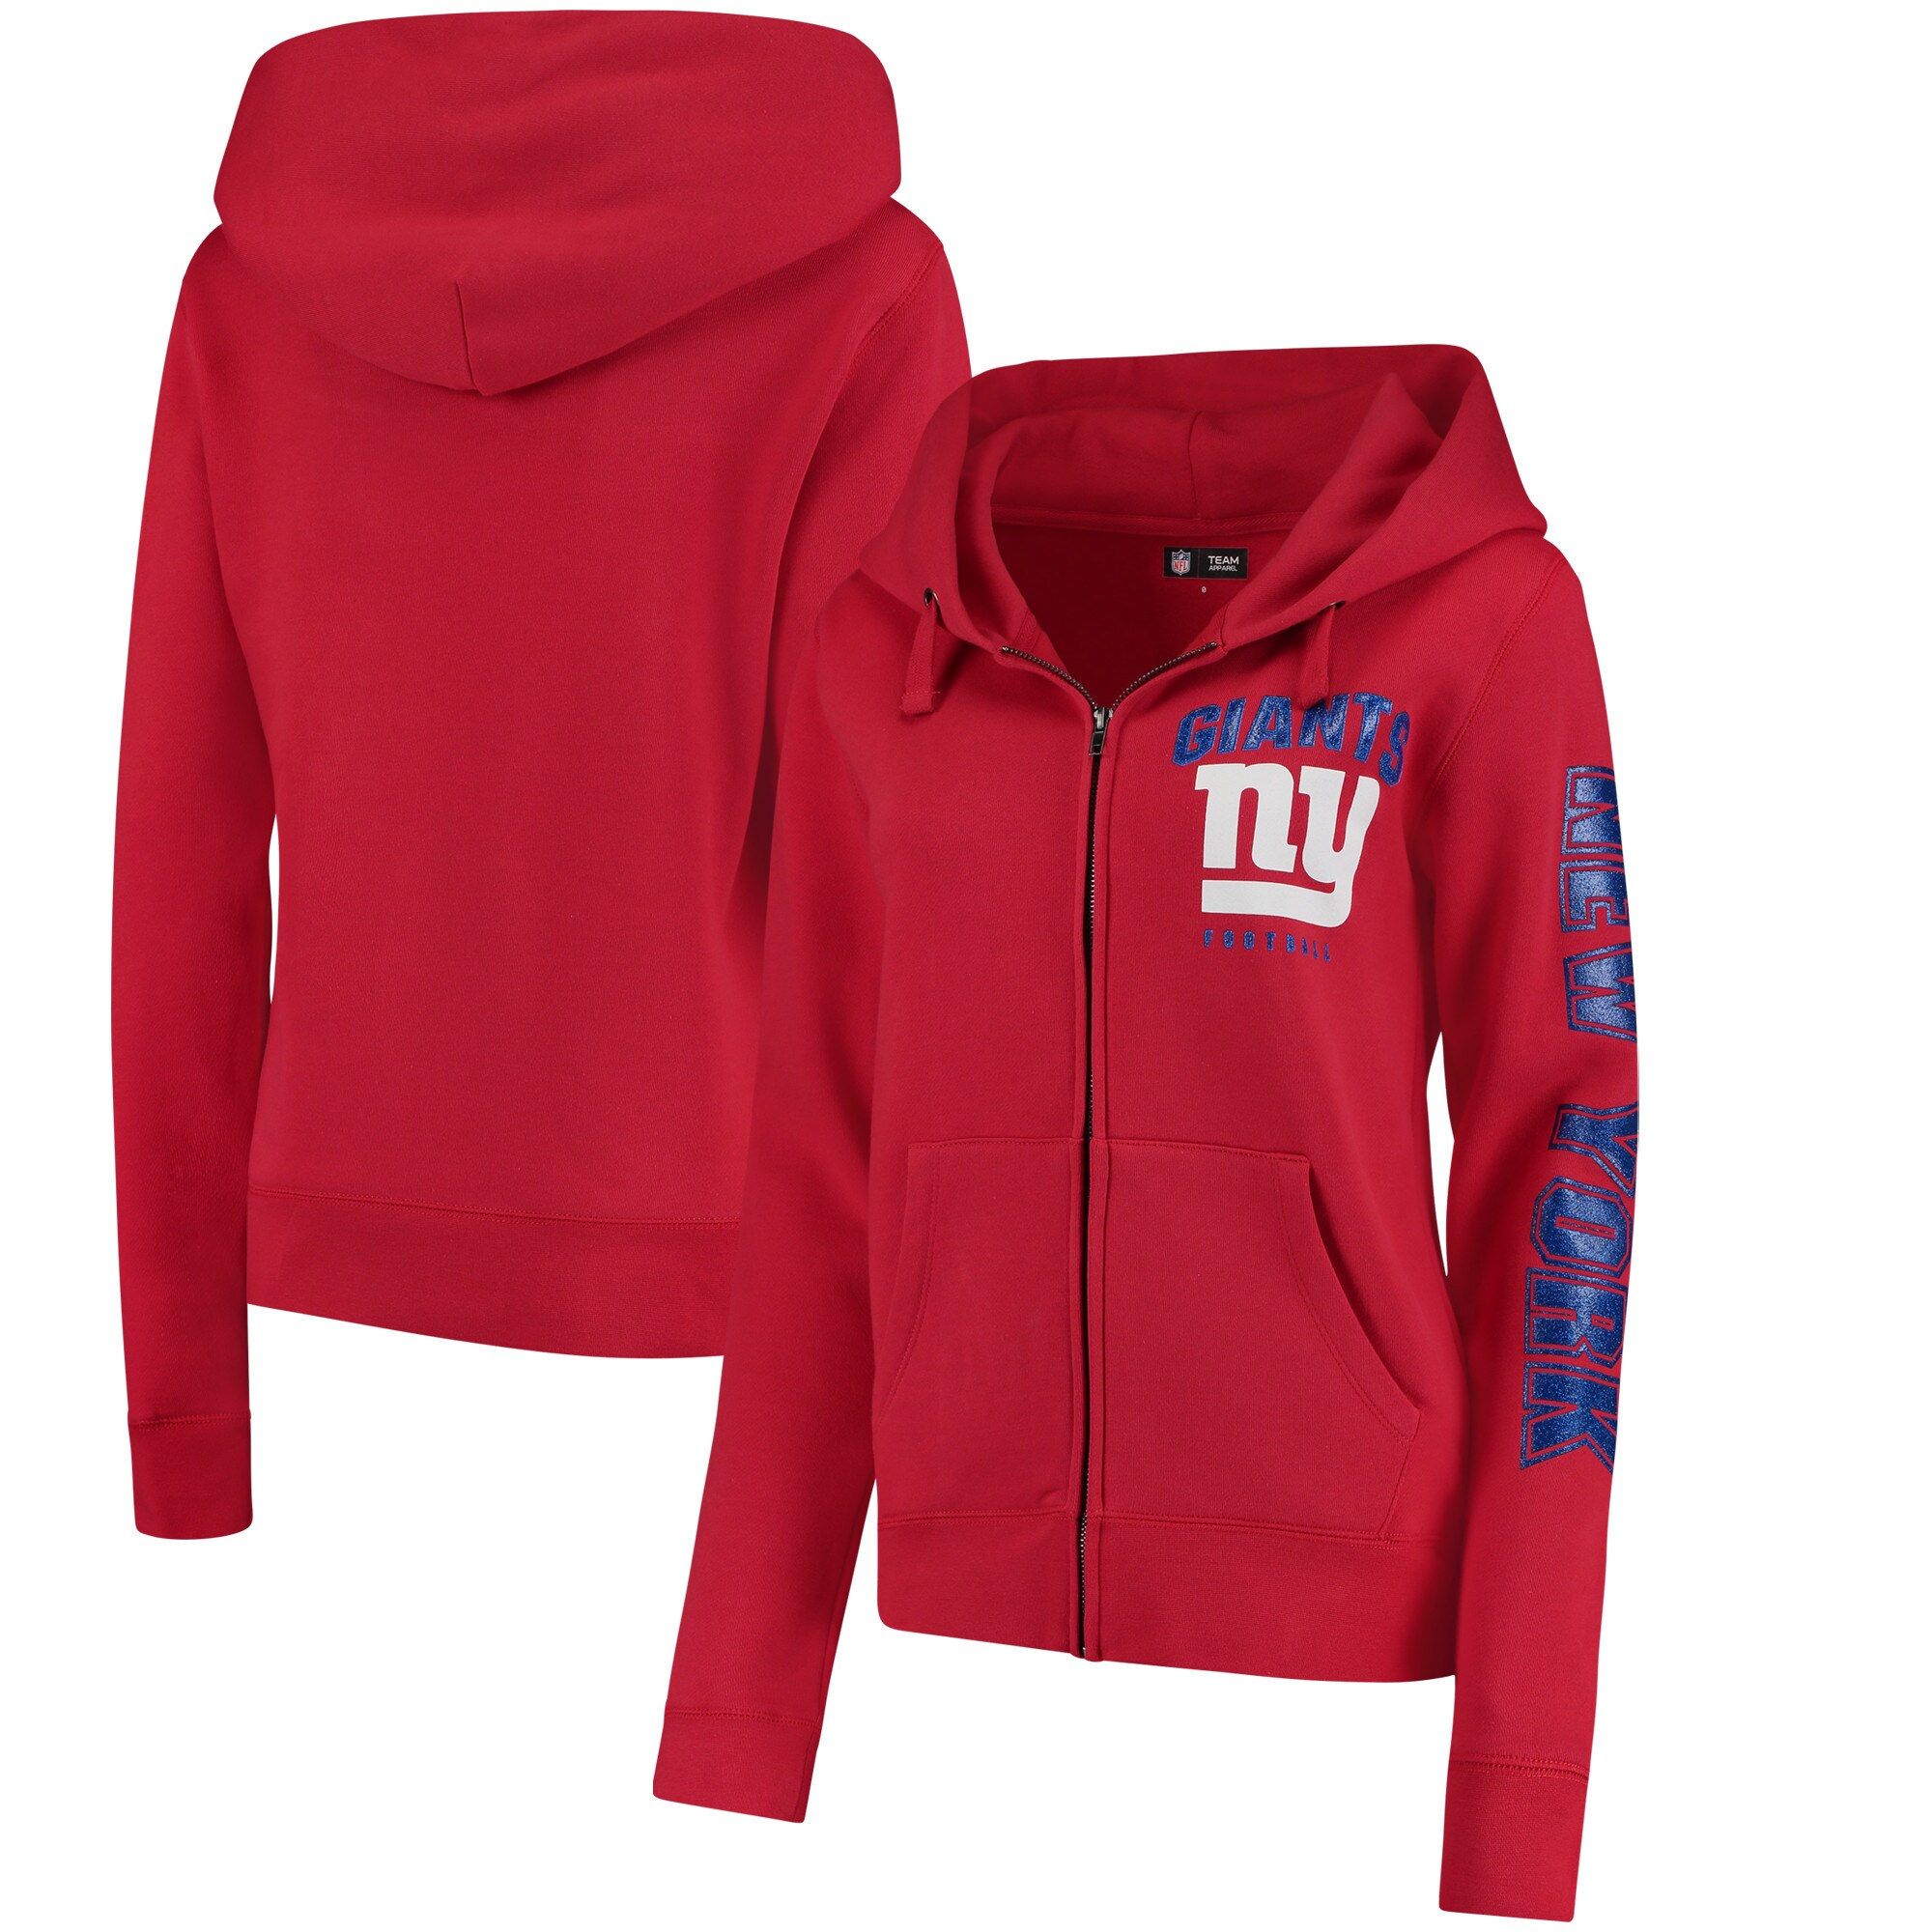 New York Giants New Era Women's Playbook Glitter Sleeve Full-Zip Hoodie - Red